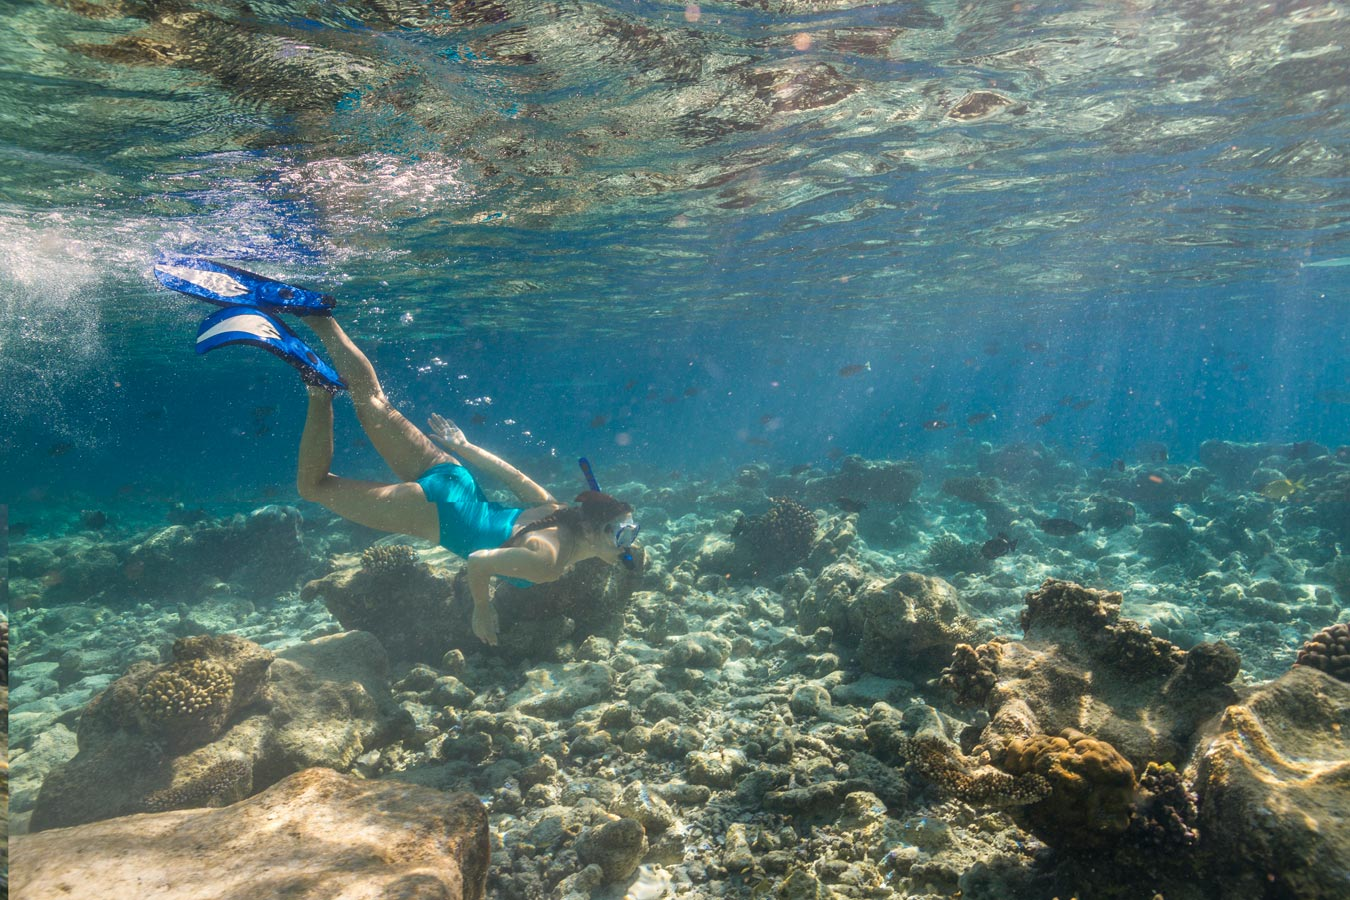 Snorkelling at Kurumba Maldives image| Kurumba Maldives Resort